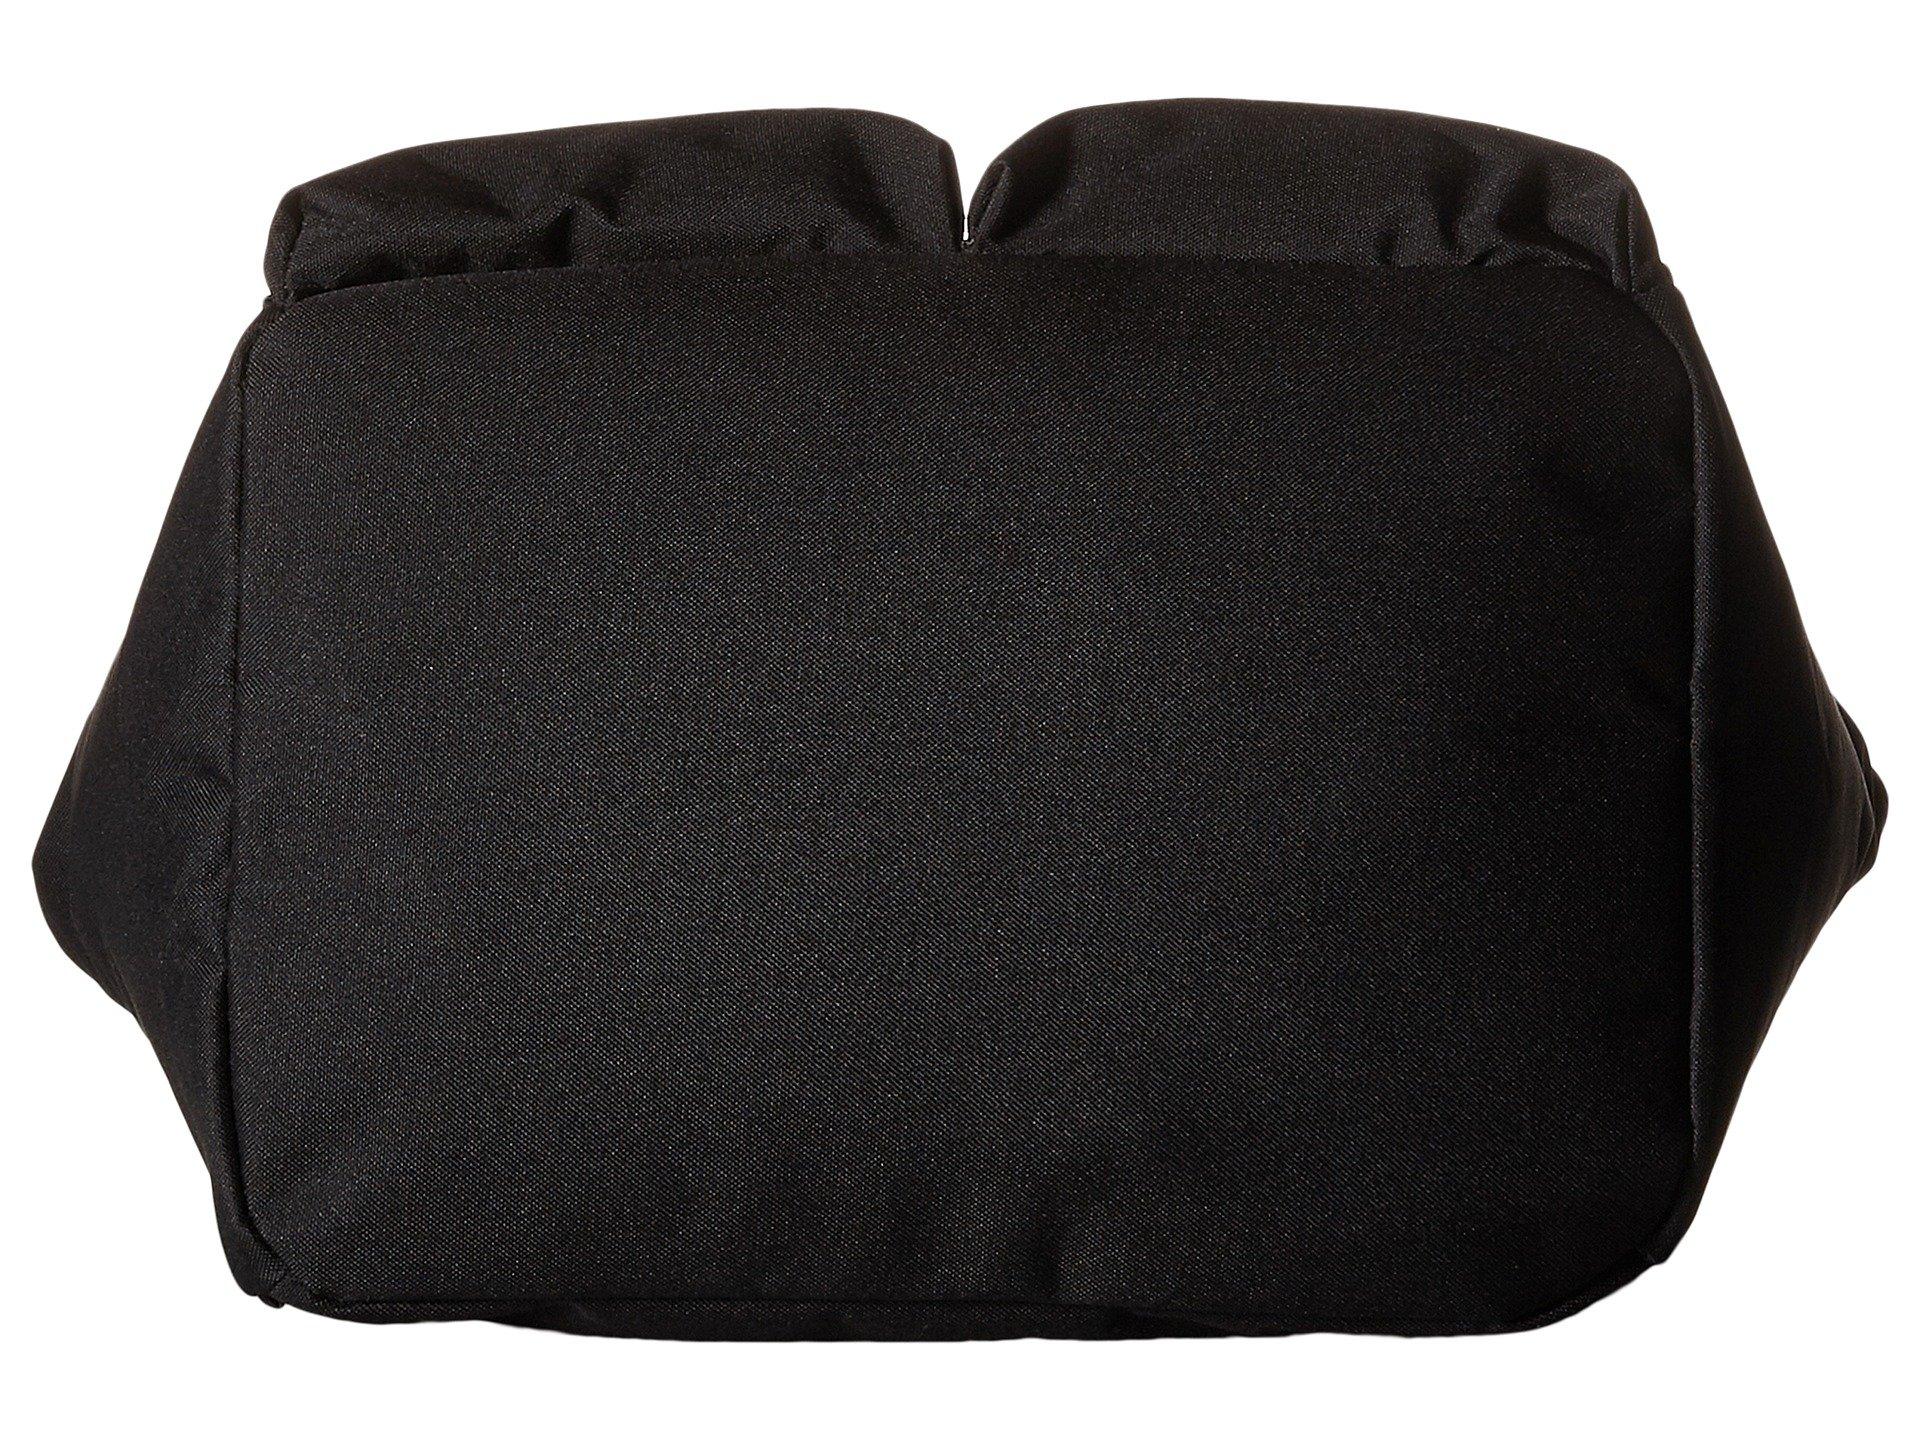 Ariat Black All Ariat Carry Mini Carry Mini All 4p50wCqC